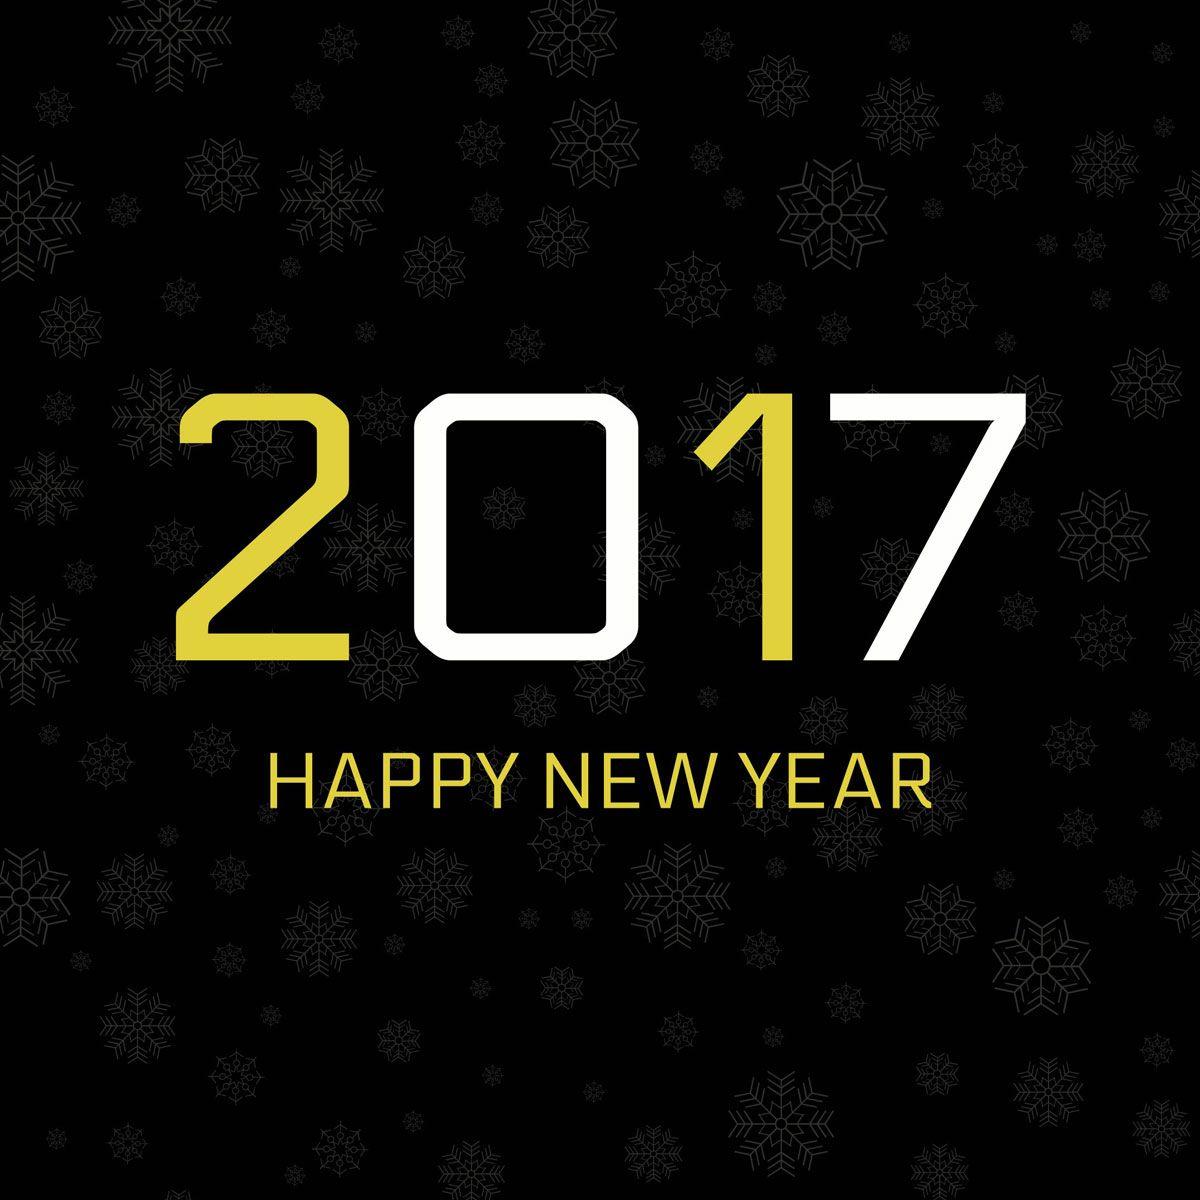 malayalam new year wallpapers